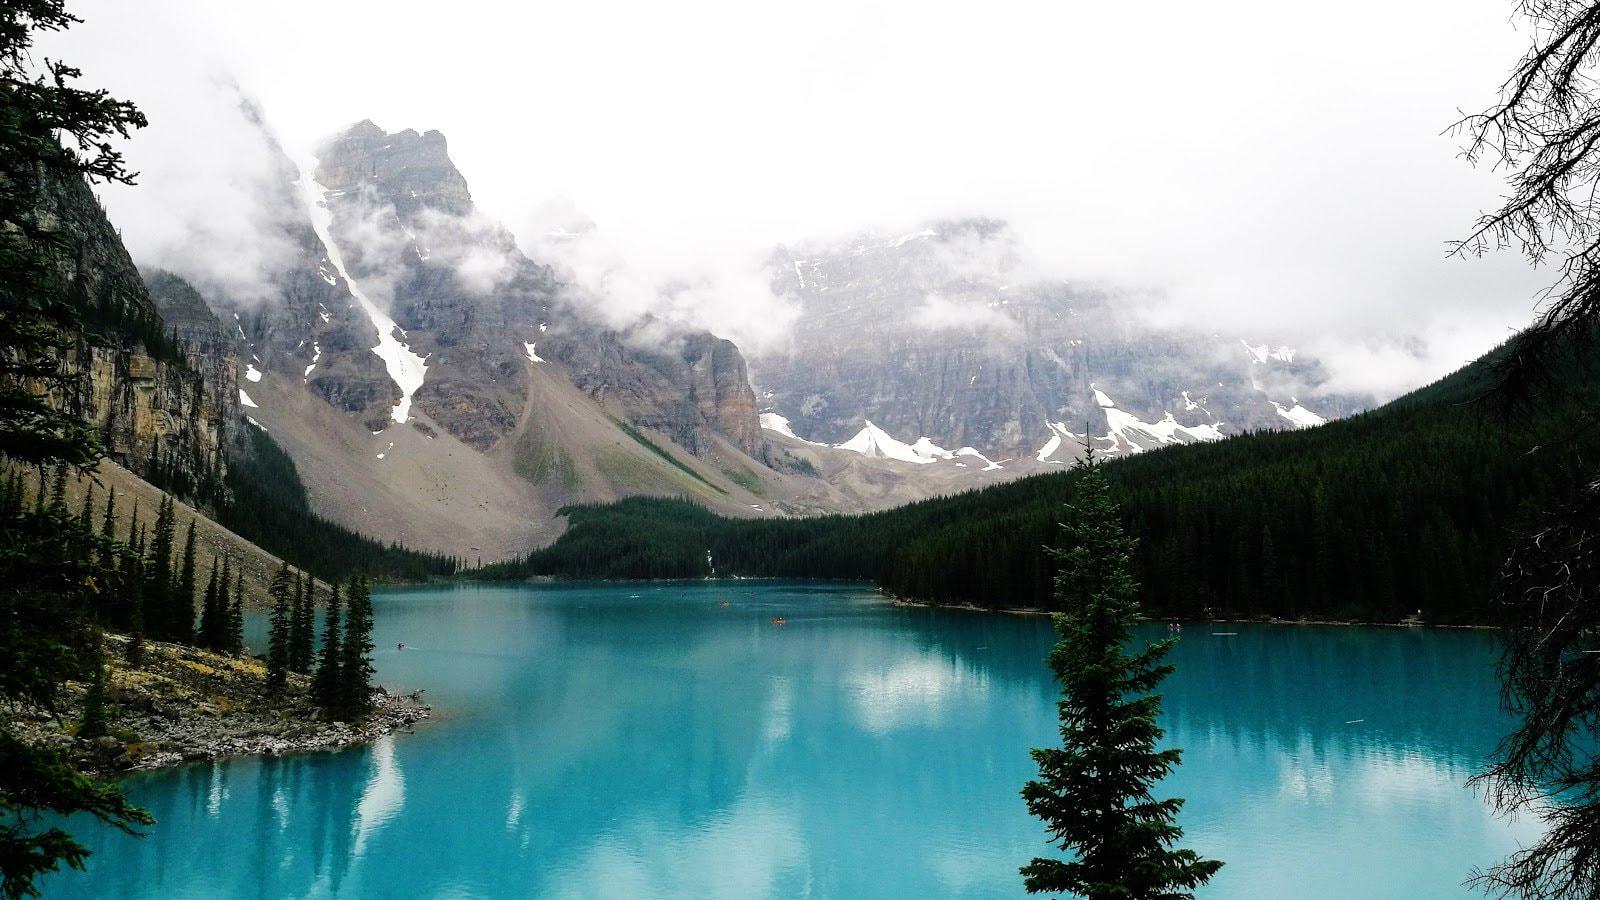 Blue lake and mountains by Danyu Wang